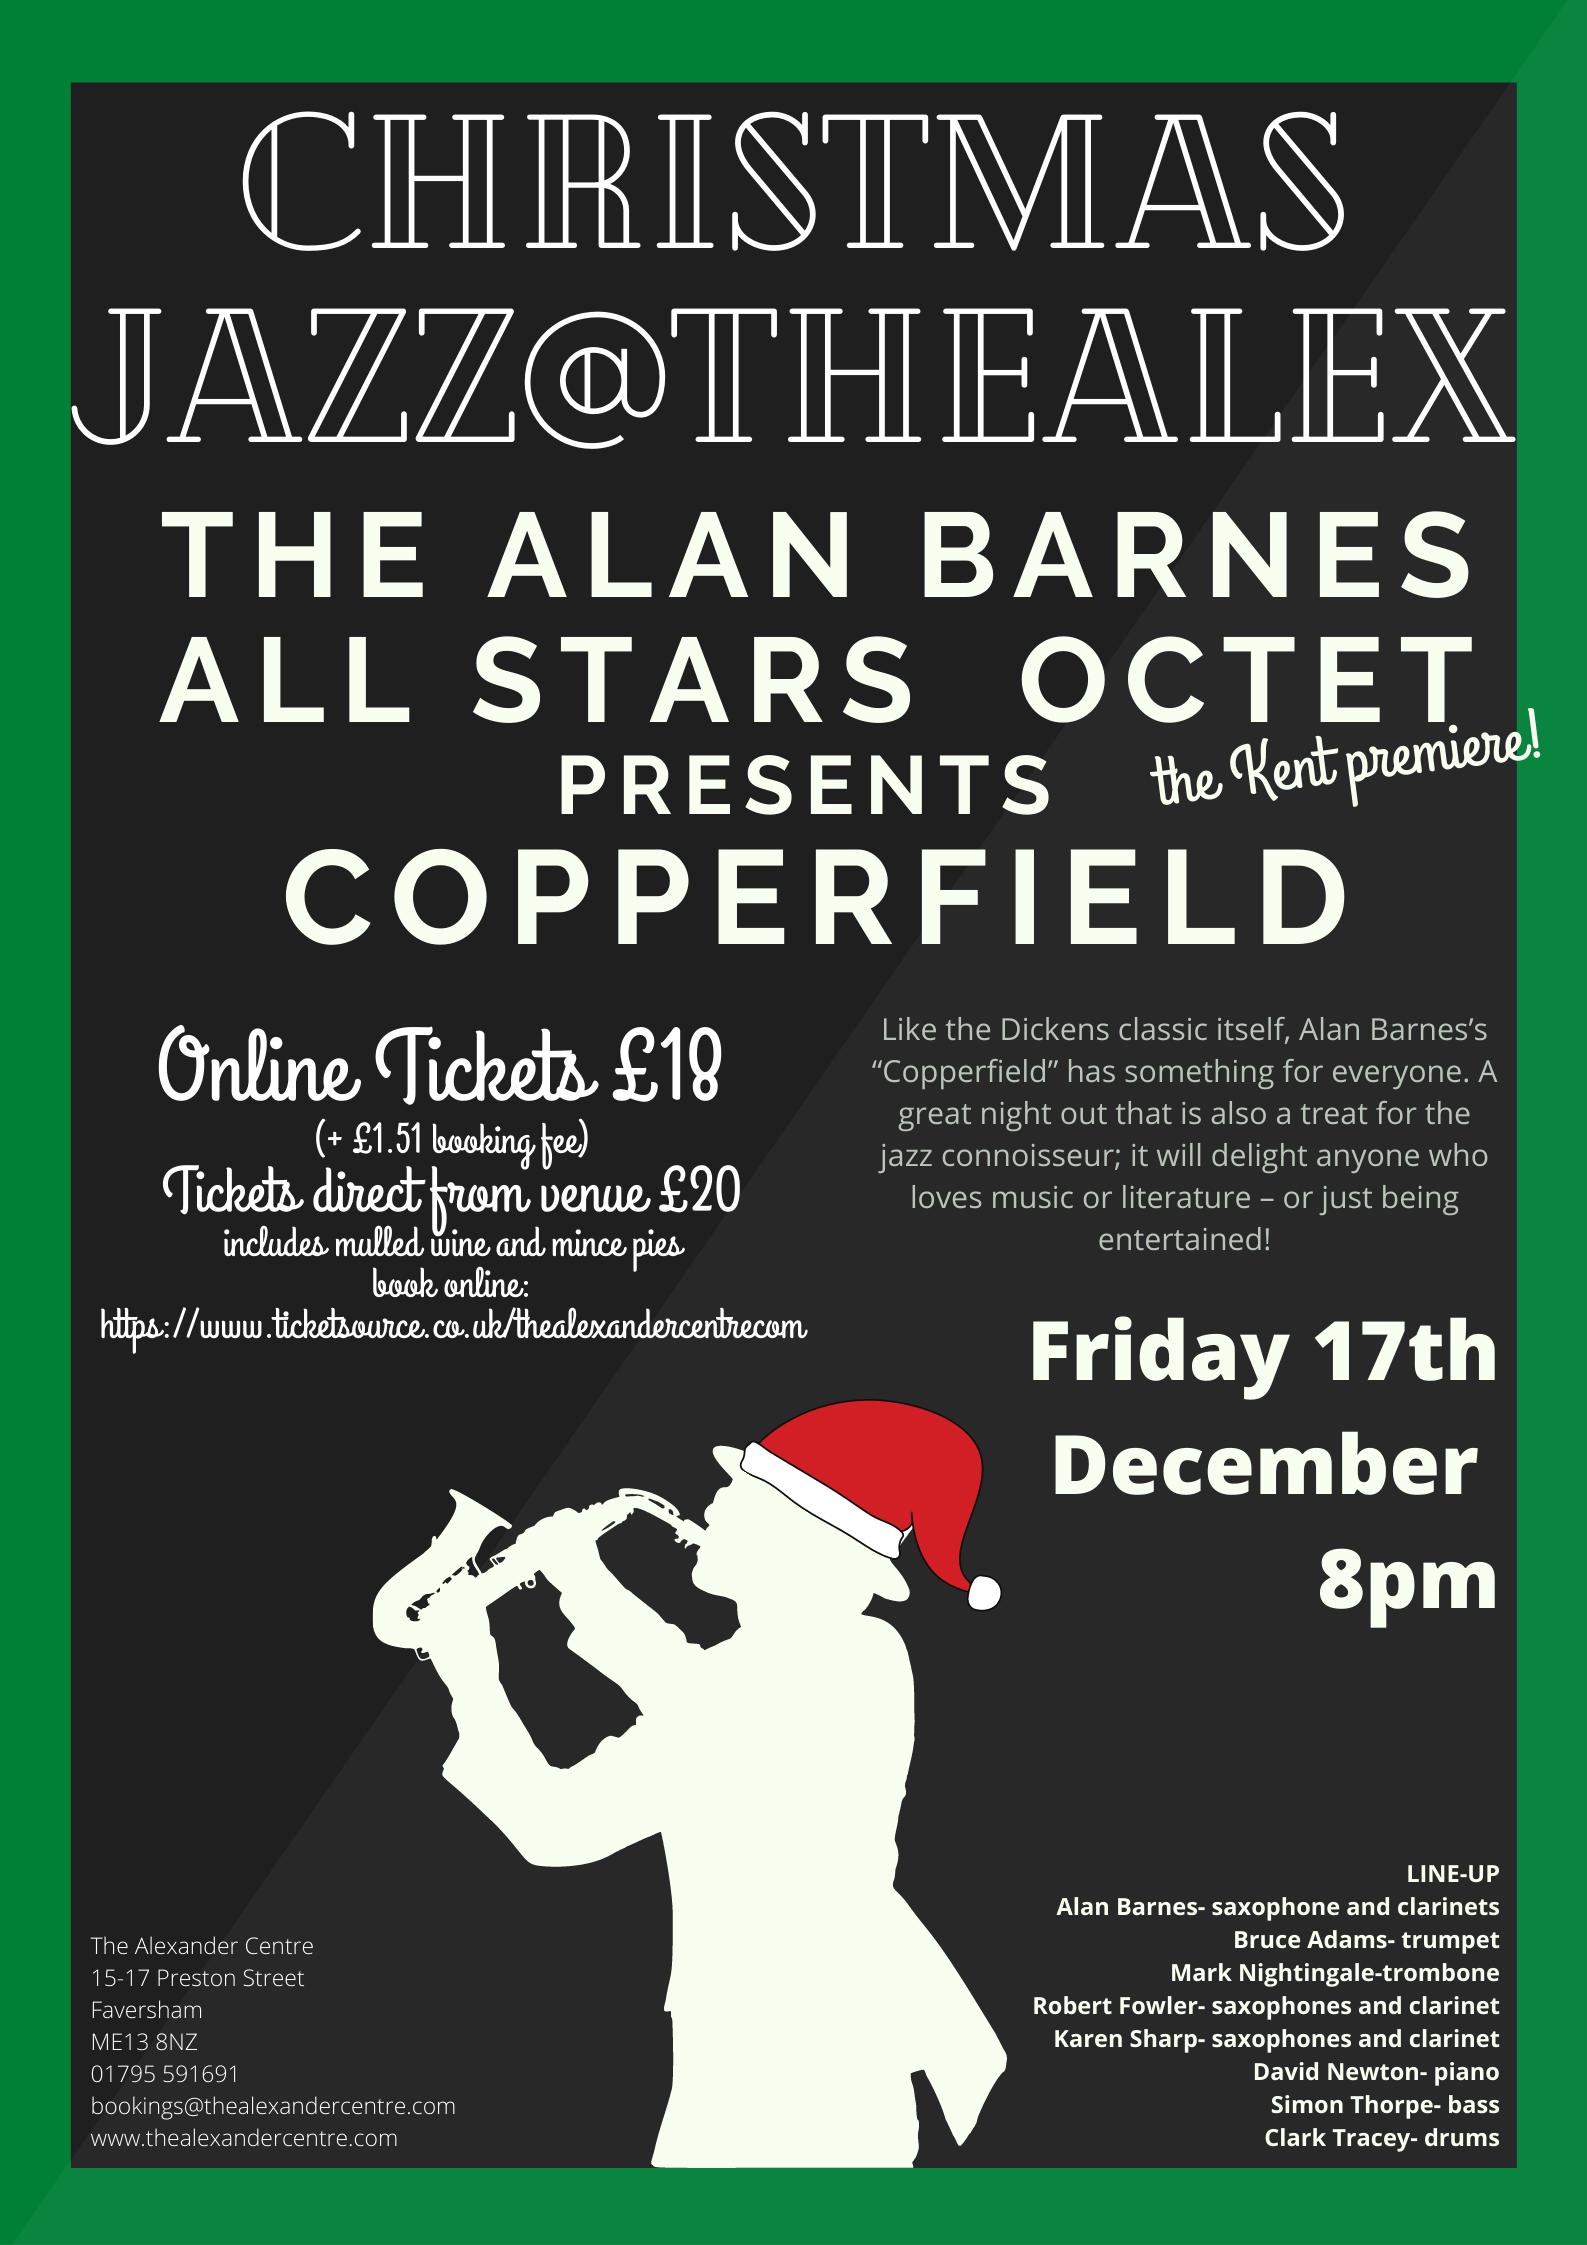 Christmas Jazz@theAlex: The Alan Barnes All Stars Octet presents 'Copperfield'